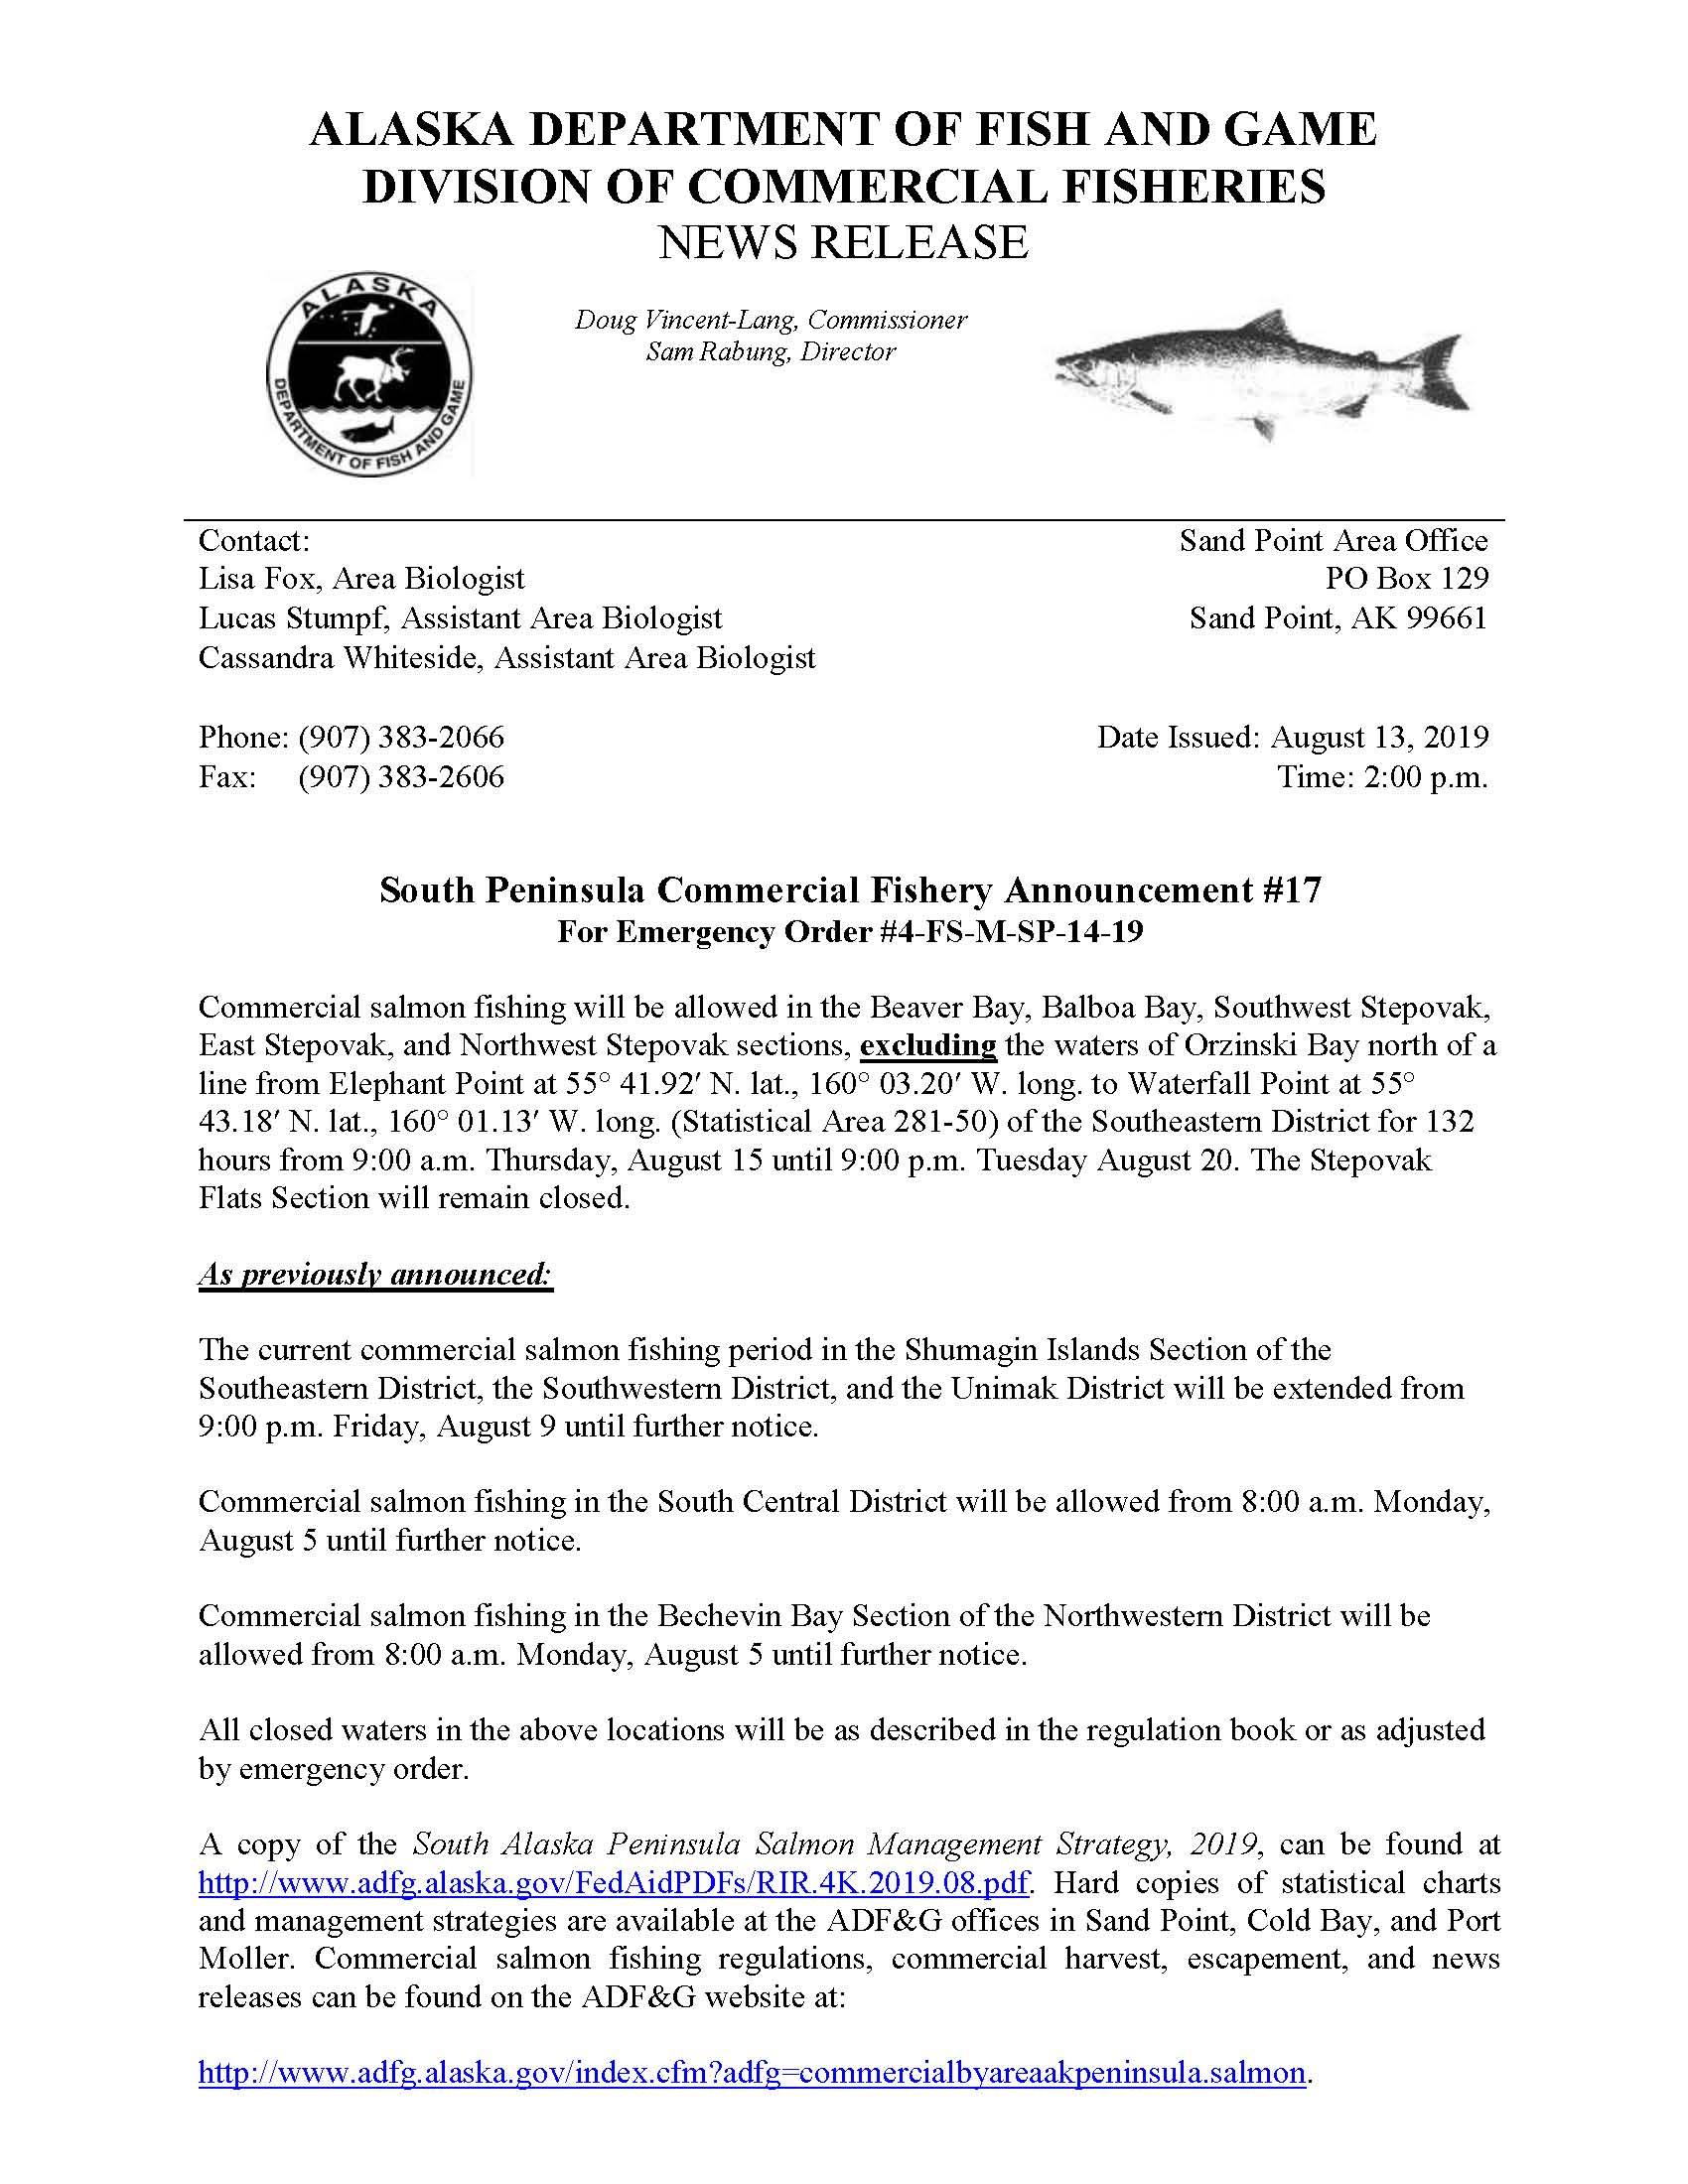 Fisheries News Archive - 830 AM KSDP – Sand Point, AK